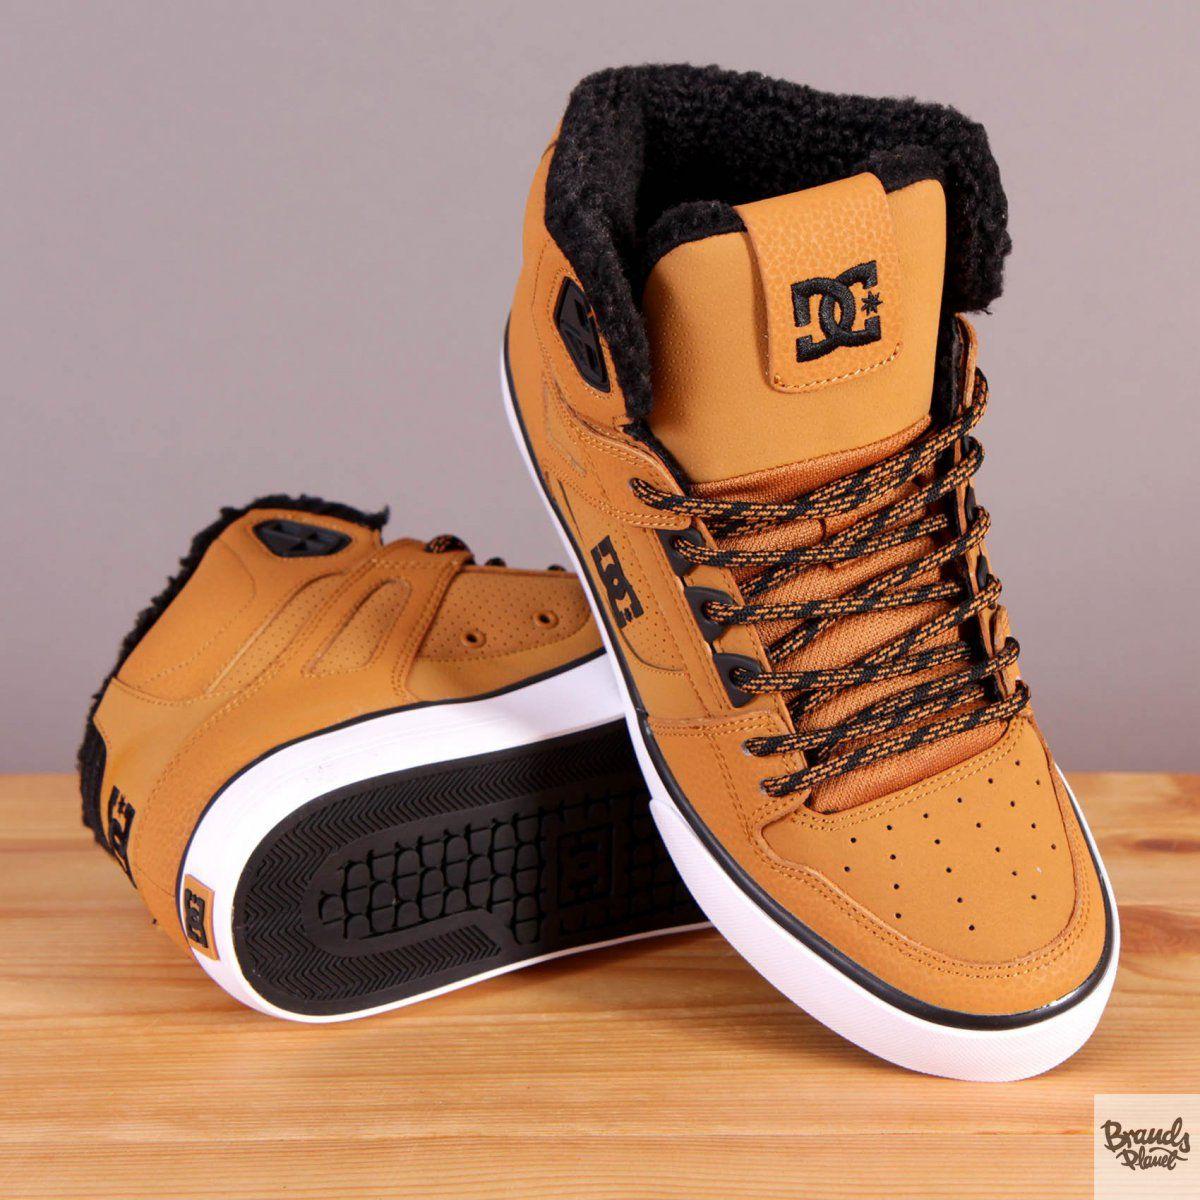 Meskie Buty Zimowe Ocieplane Za Kostke Dc Spartan High Wc Wnt Wheat Www Brandsplanet Pl Dc Shoes Skateboar Dc Shoes Men Mens Nike Shoes Mens Winter Boots